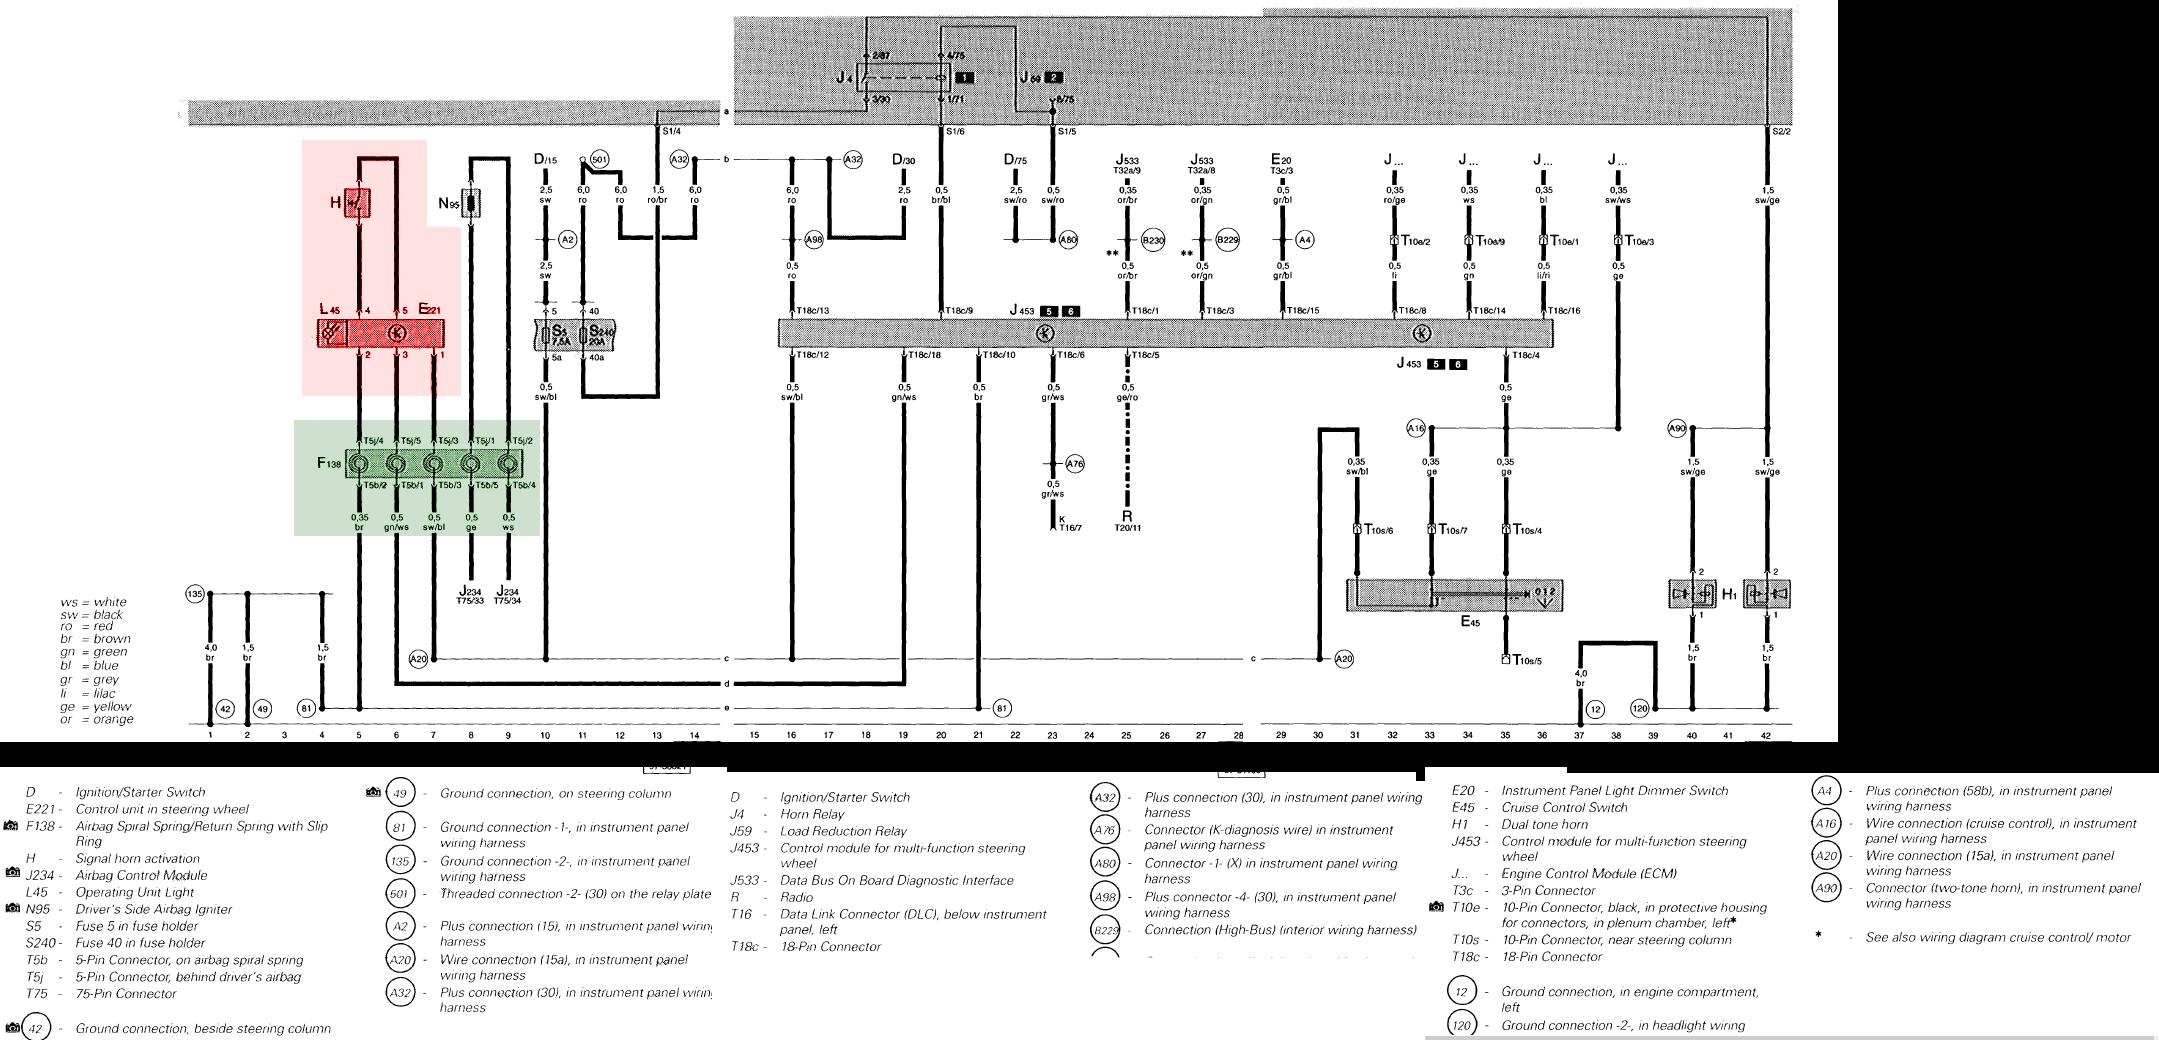 daihatsu rocky wiring diagram daihatsu rocky clutch